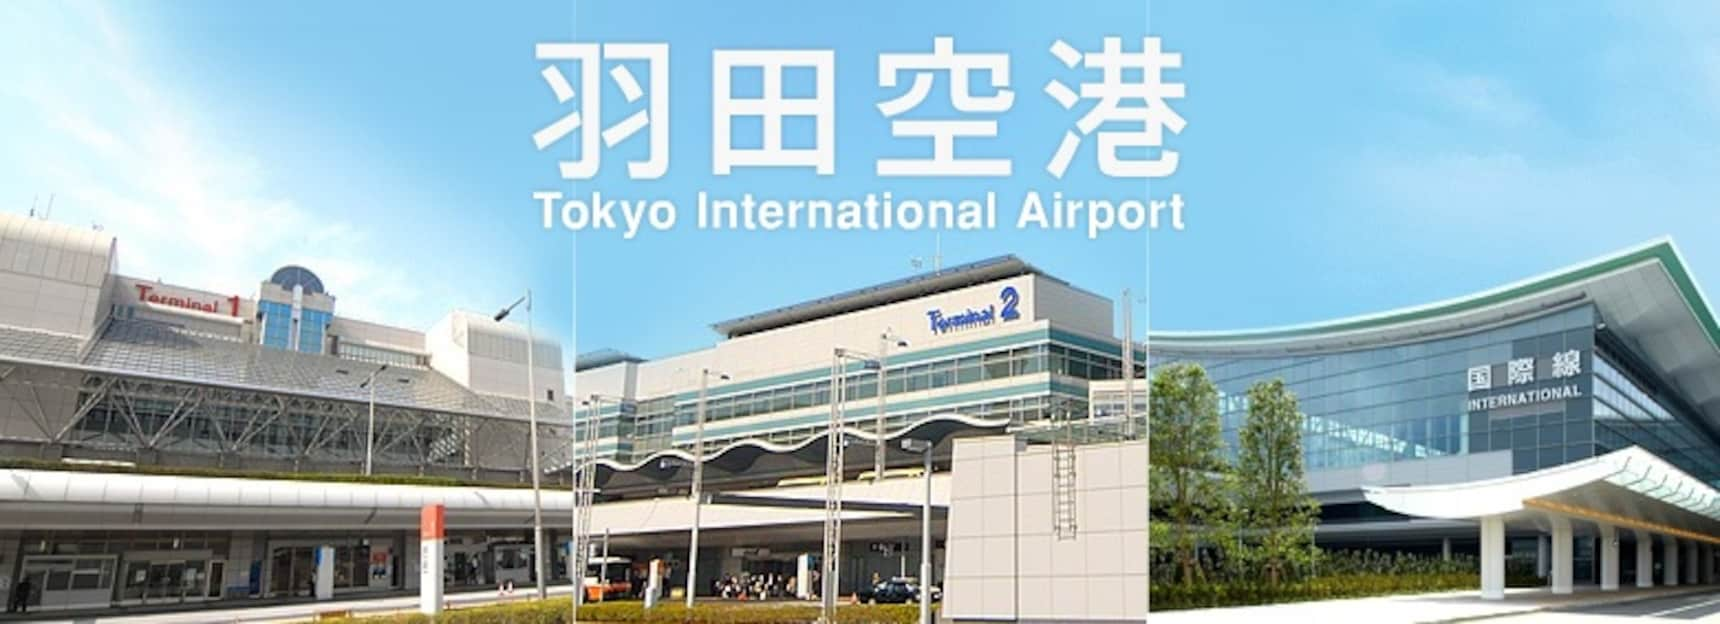 5 Must-Buy Omiyage at Tokyo Haneda Airport